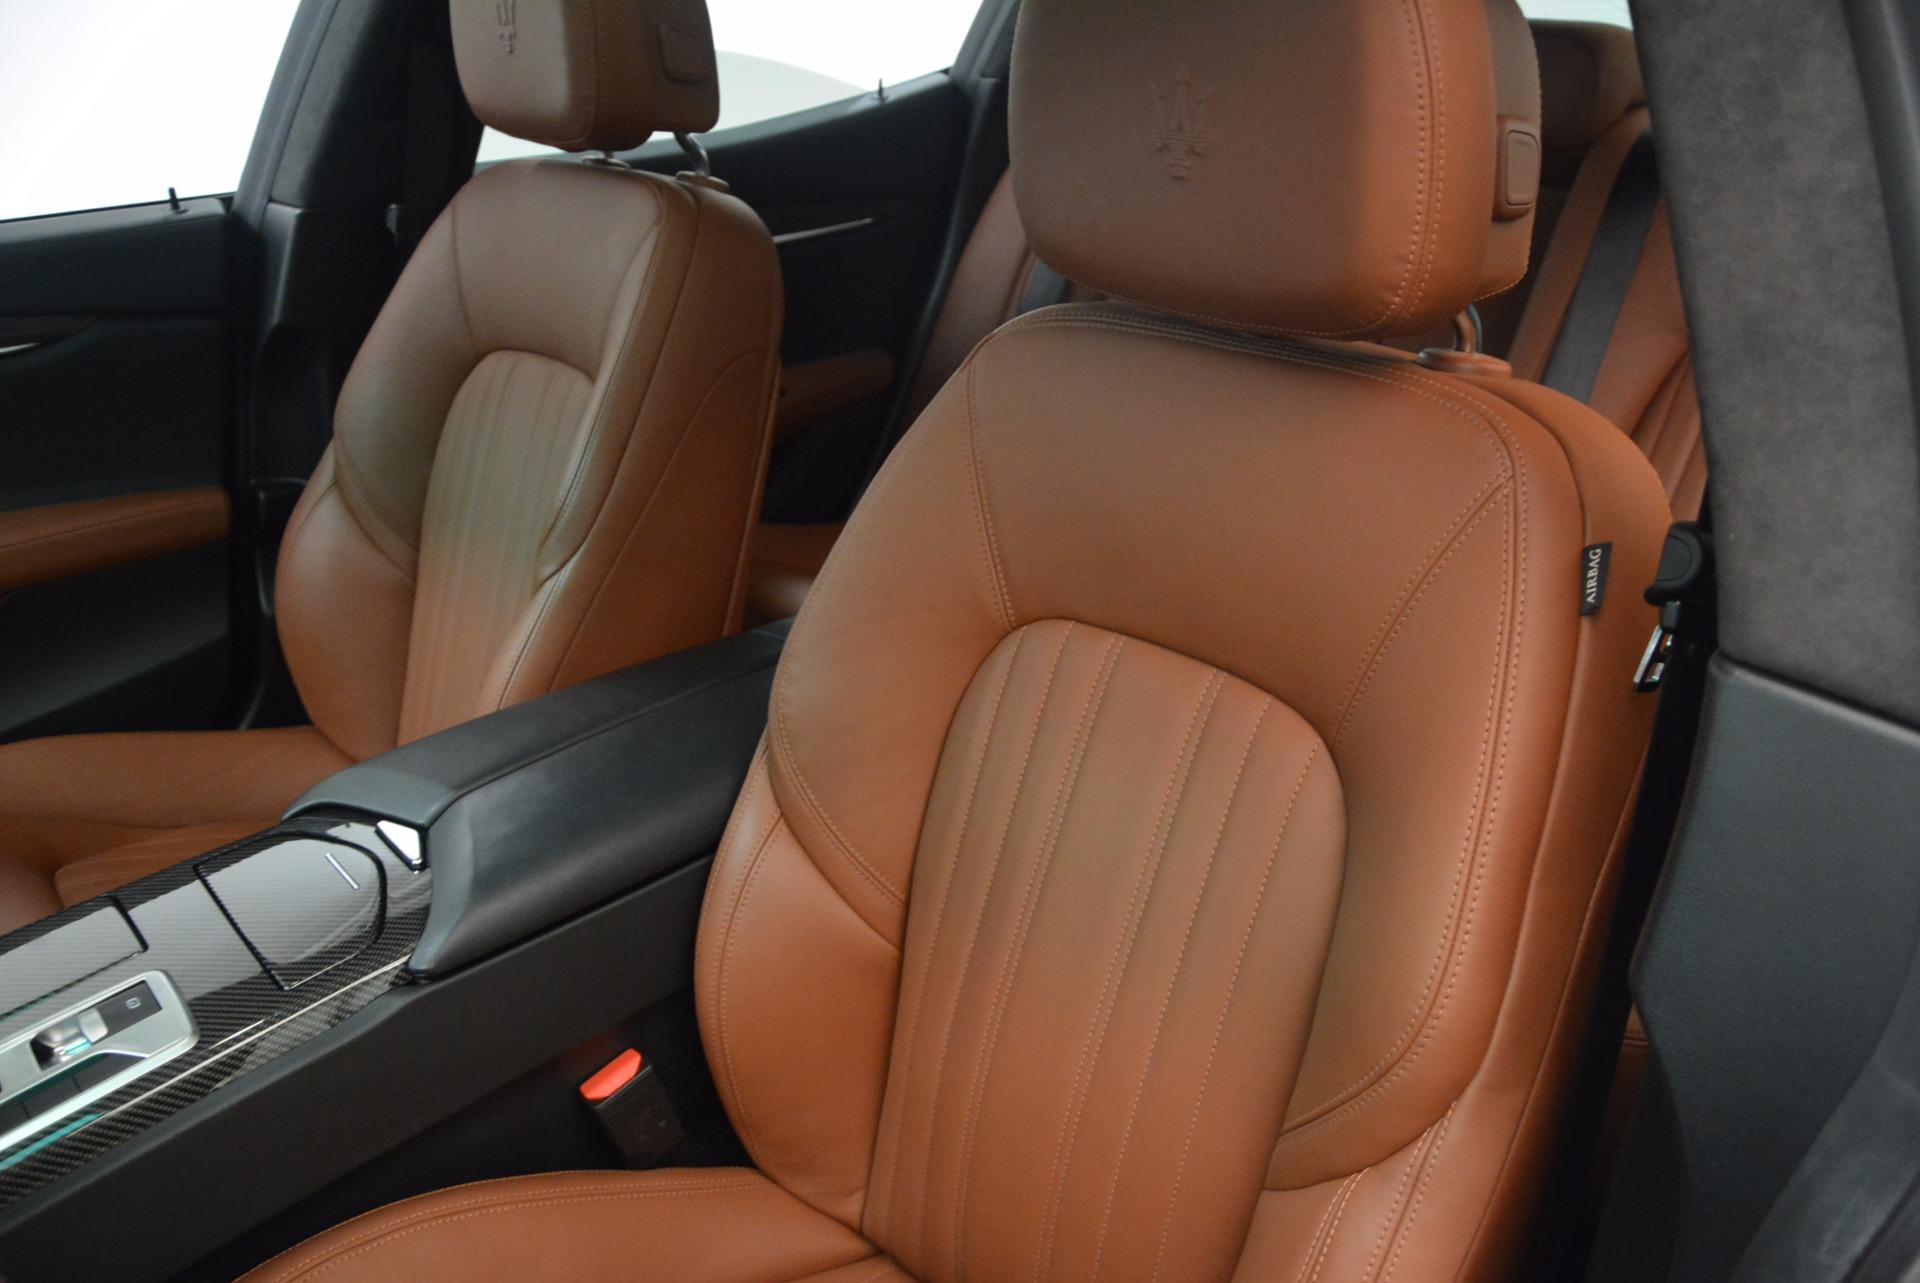 Used 2014 Maserati Ghibli S Q4 For Sale In Greenwich, CT 1587_p16